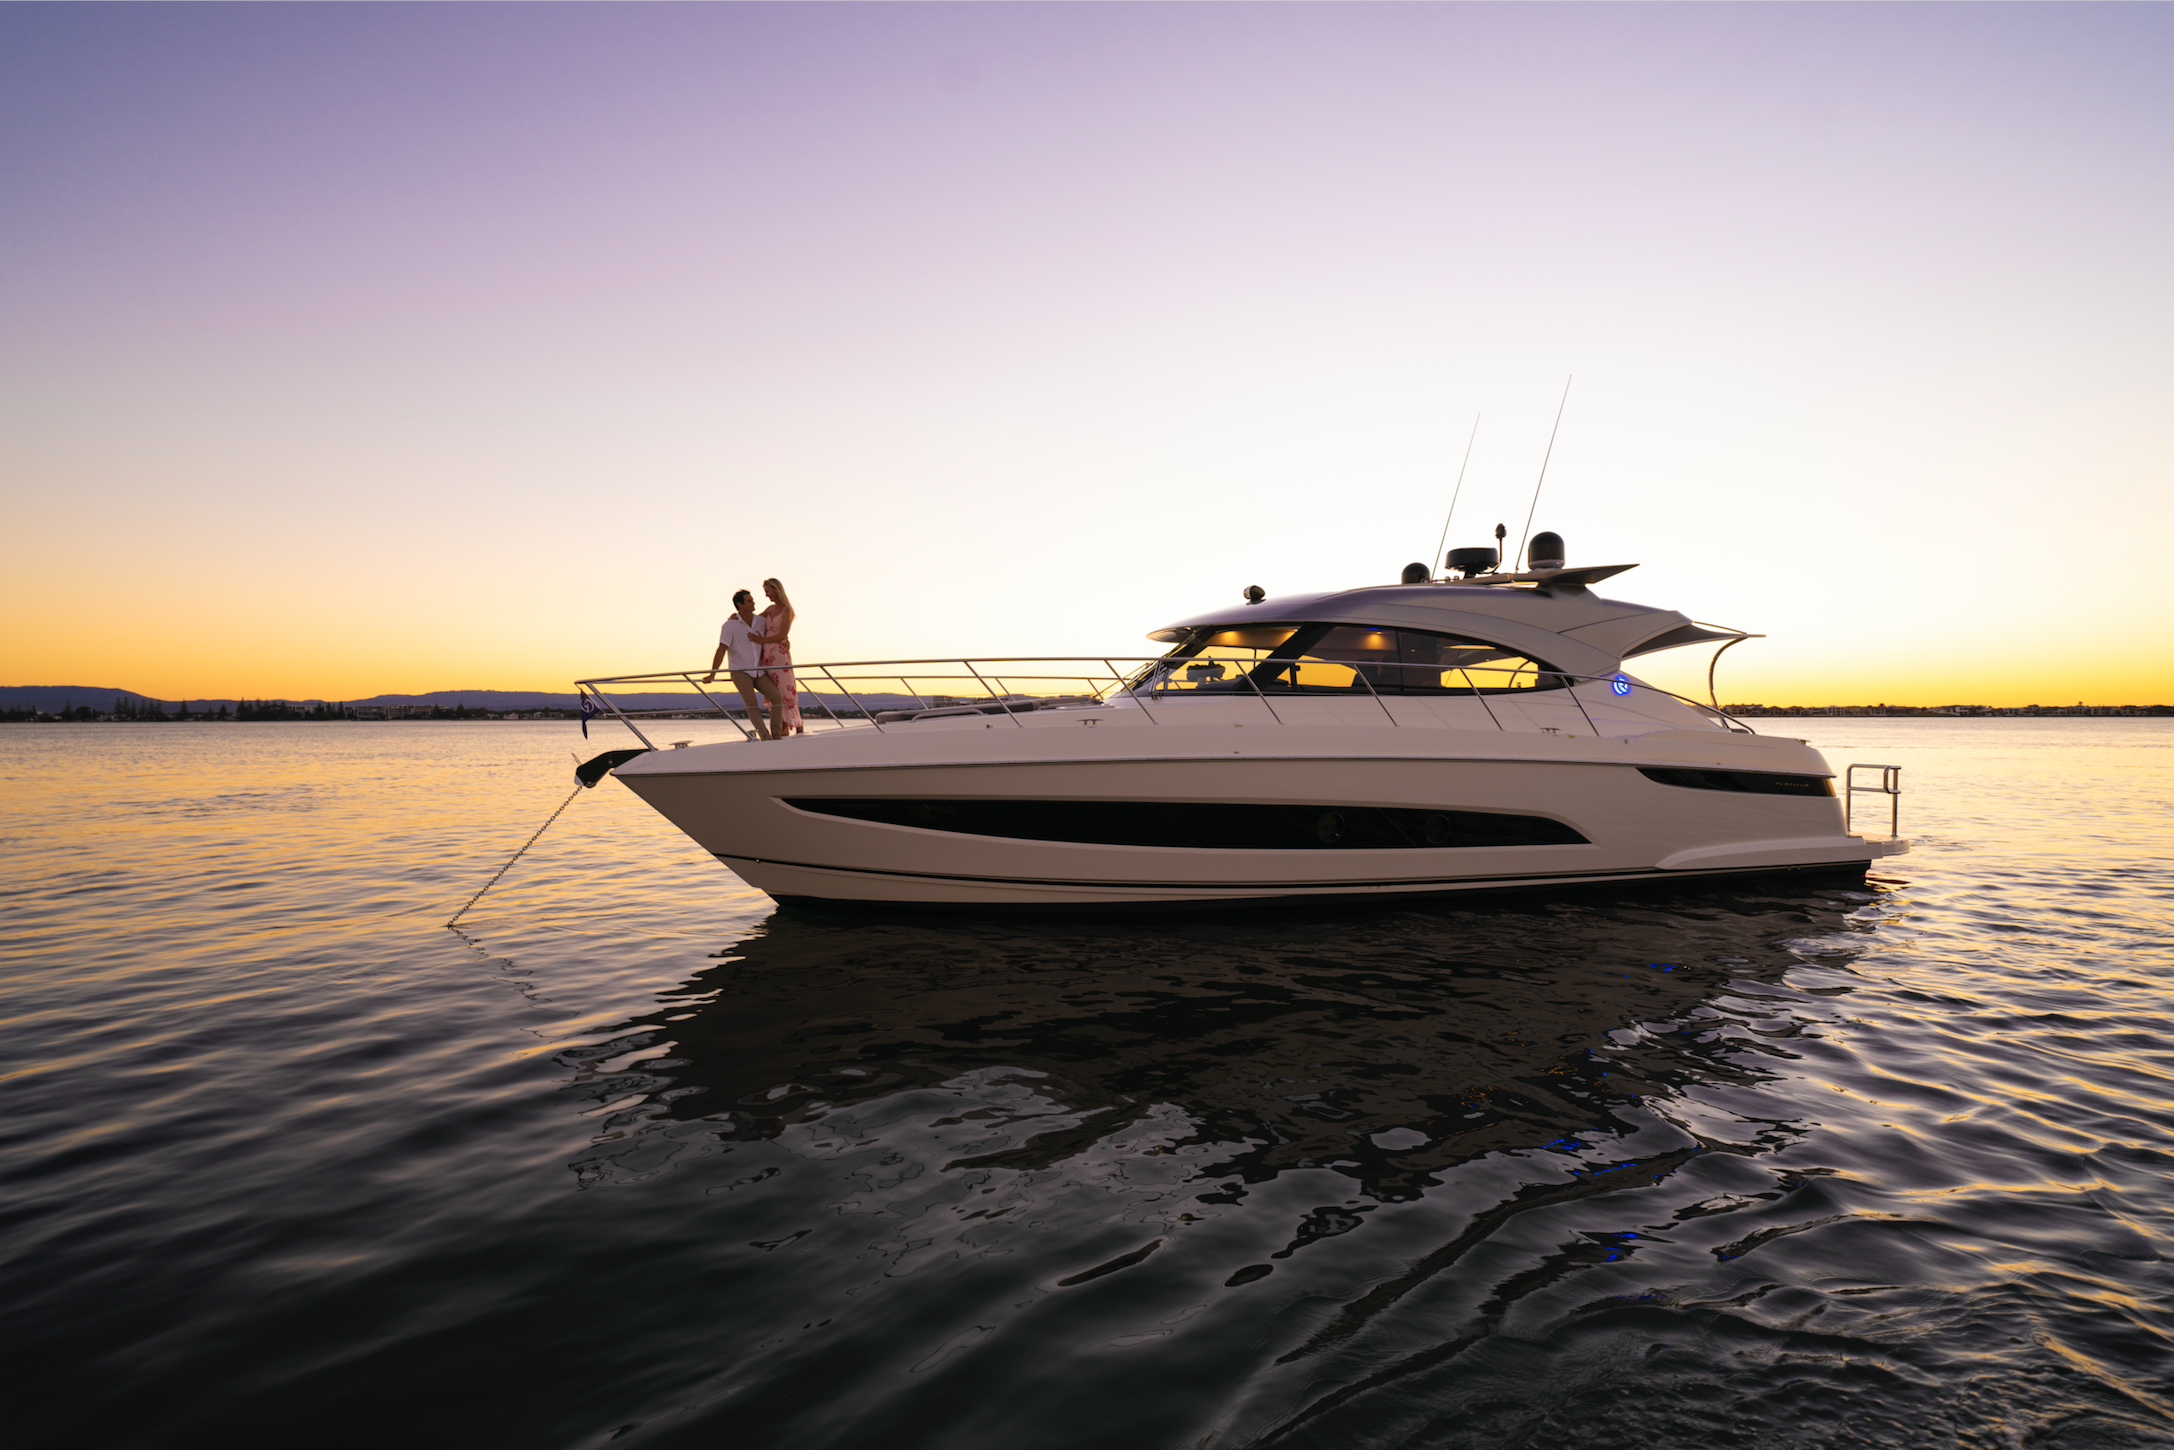 Riviera 4800 Sport Yacht, Platnium Edition now available